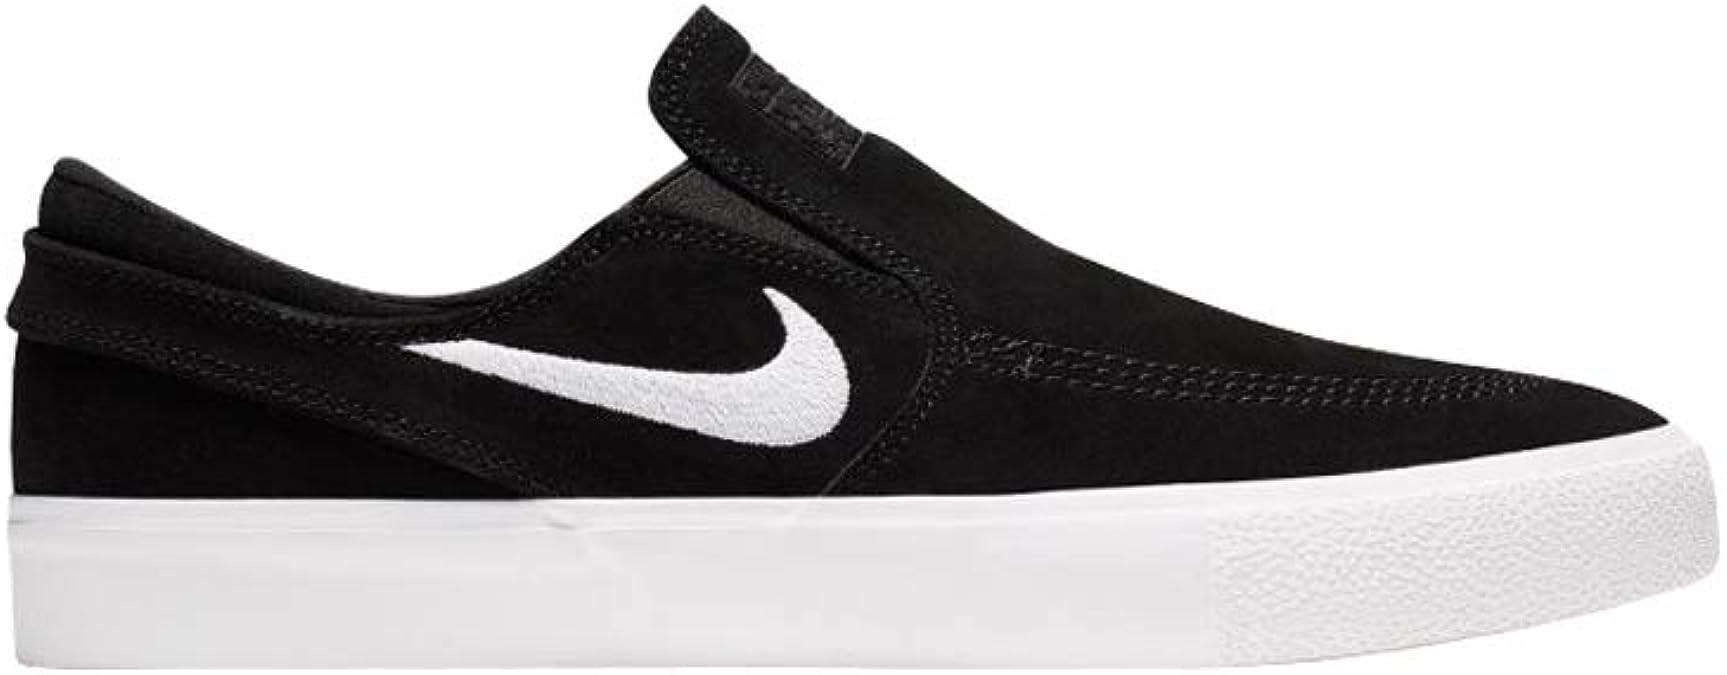 Nike SB Zoom Stefan Janoski Slip RM Men's Shoes - AT8899